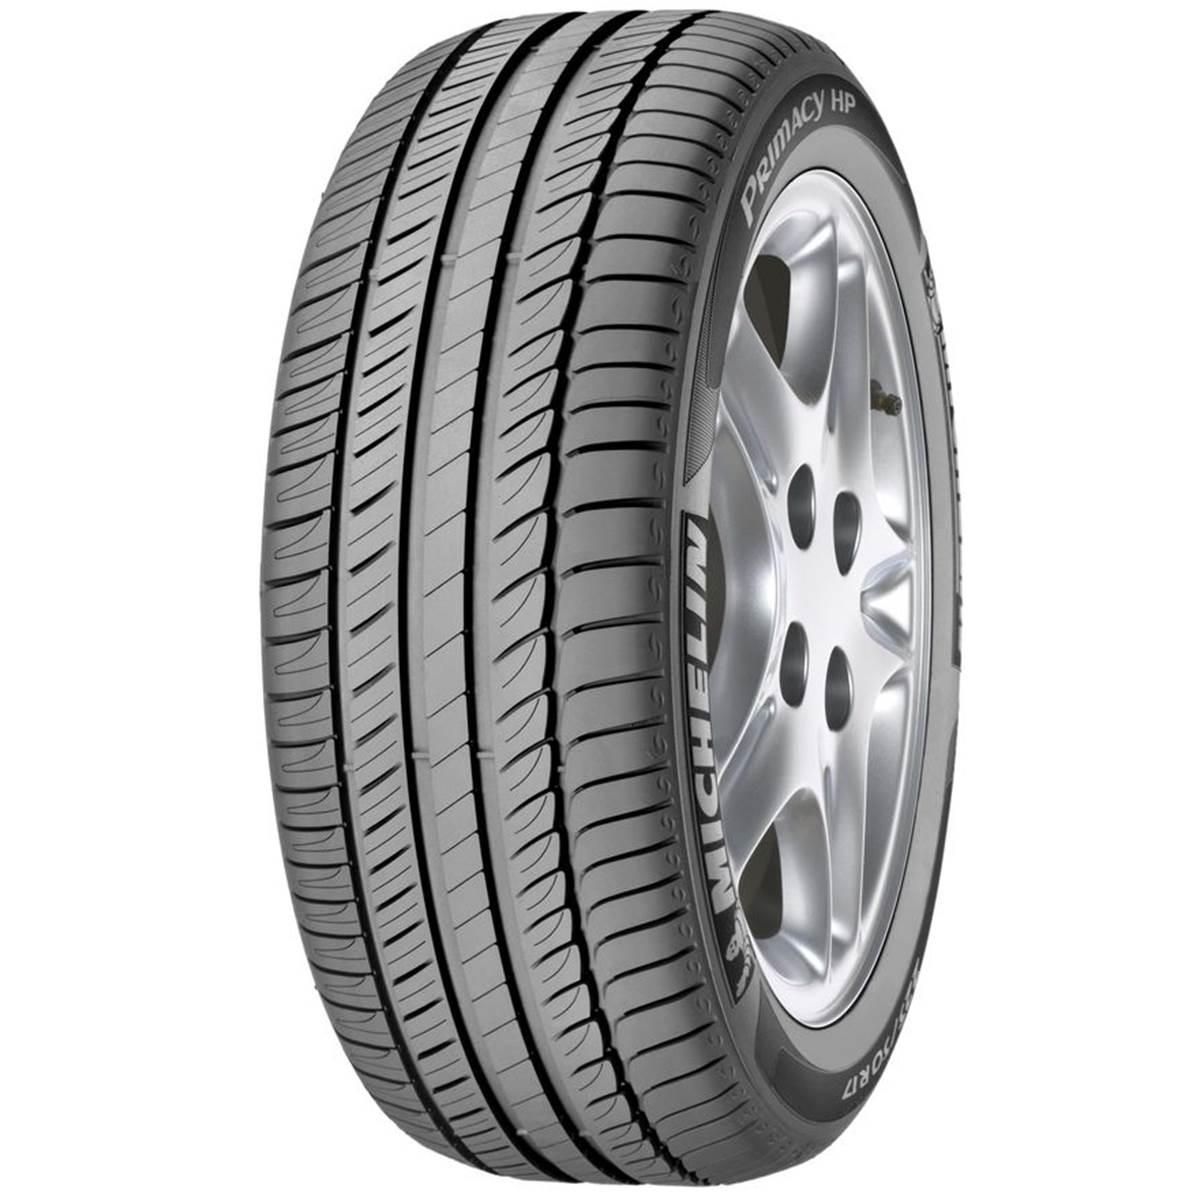 Pneu Michelin 245/45R17 95Y Primacy Hp